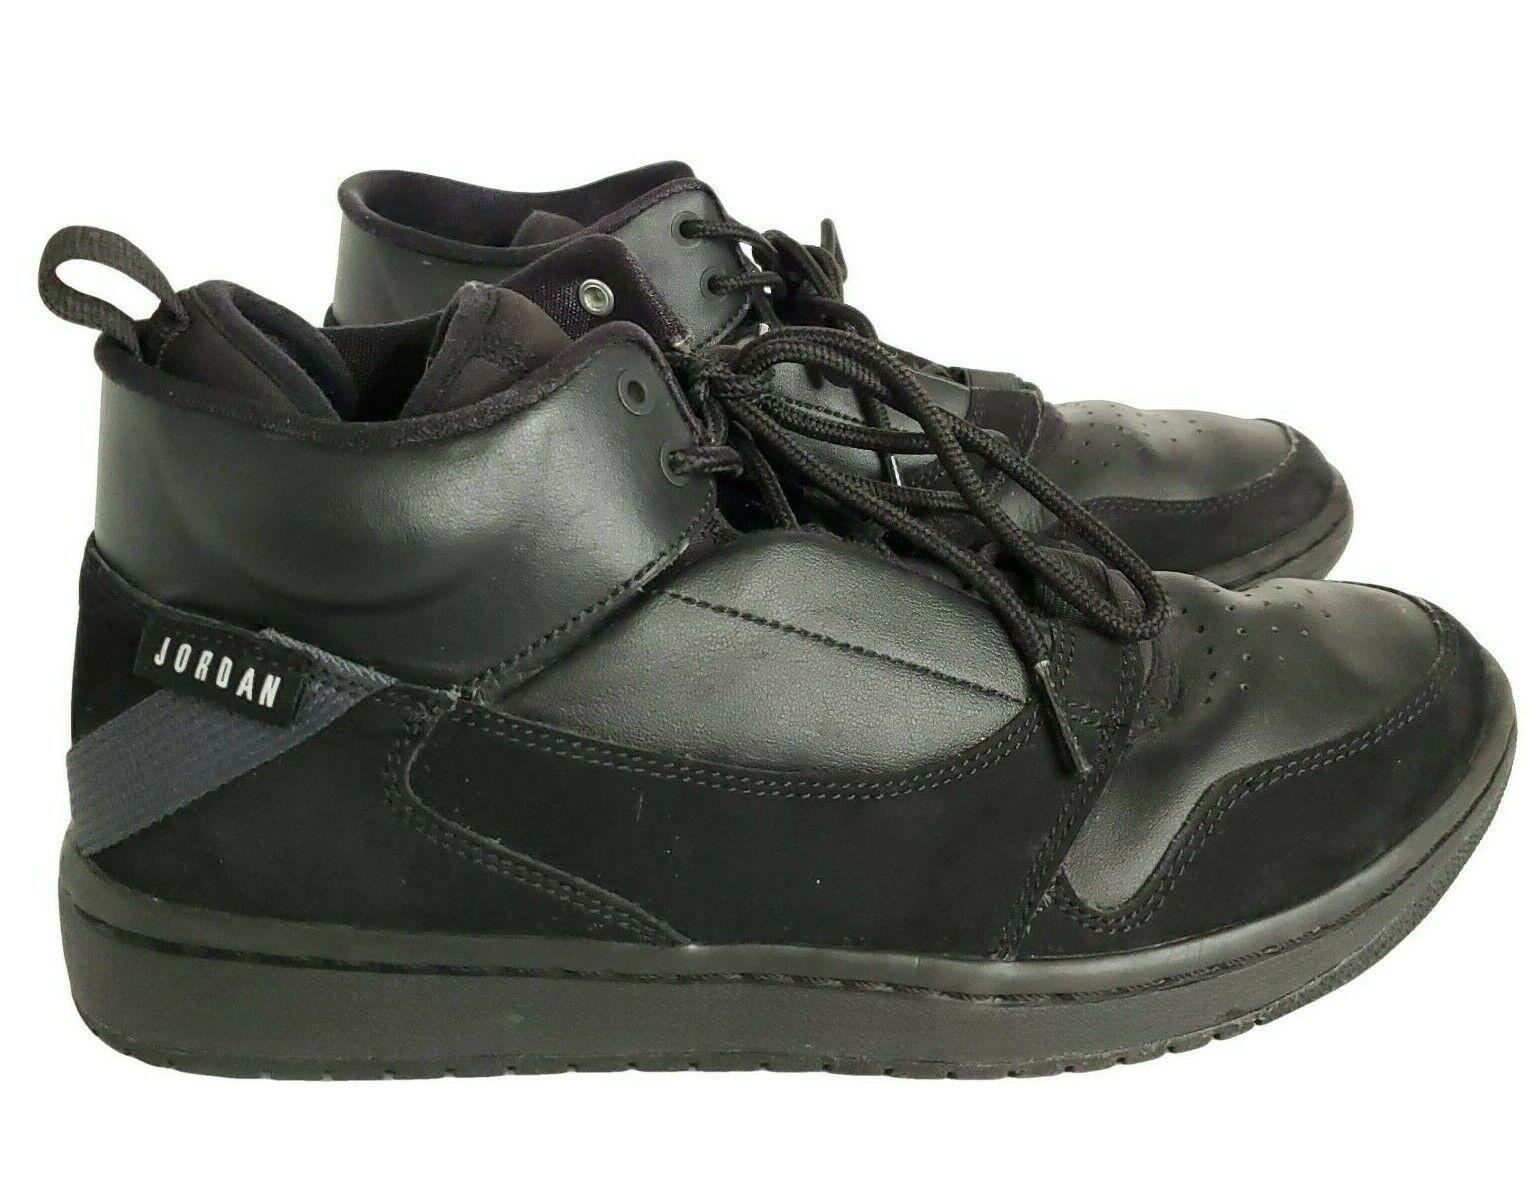 Nike Air Jordan Fadeaway Shoes Men's 8 Black Lace Up Jordan 23 A01329-003